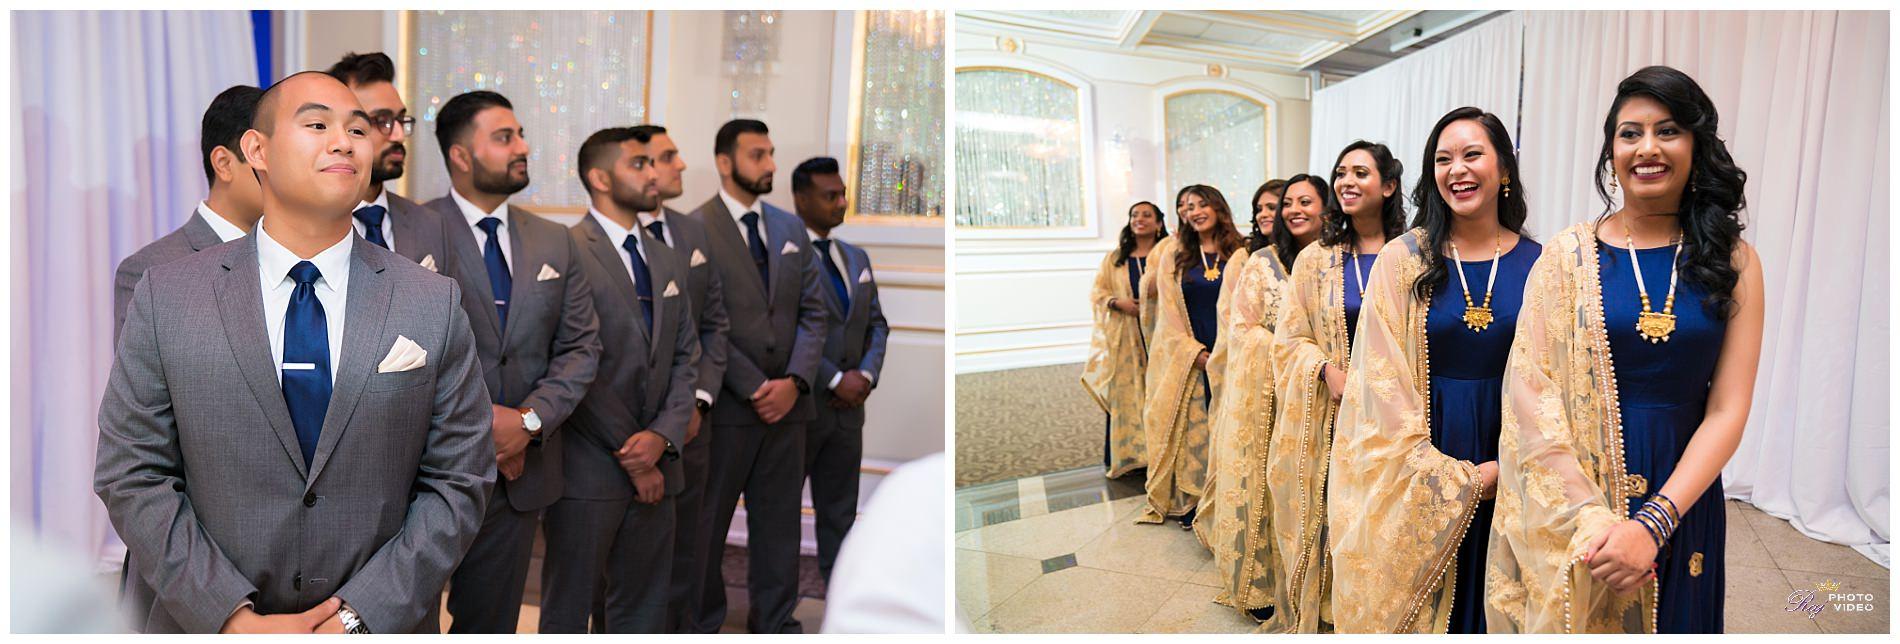 Royal-Manor-Garfield-NJ-Christian-Wedding-Ceremony-Khusbu-Jeff-40.jpg